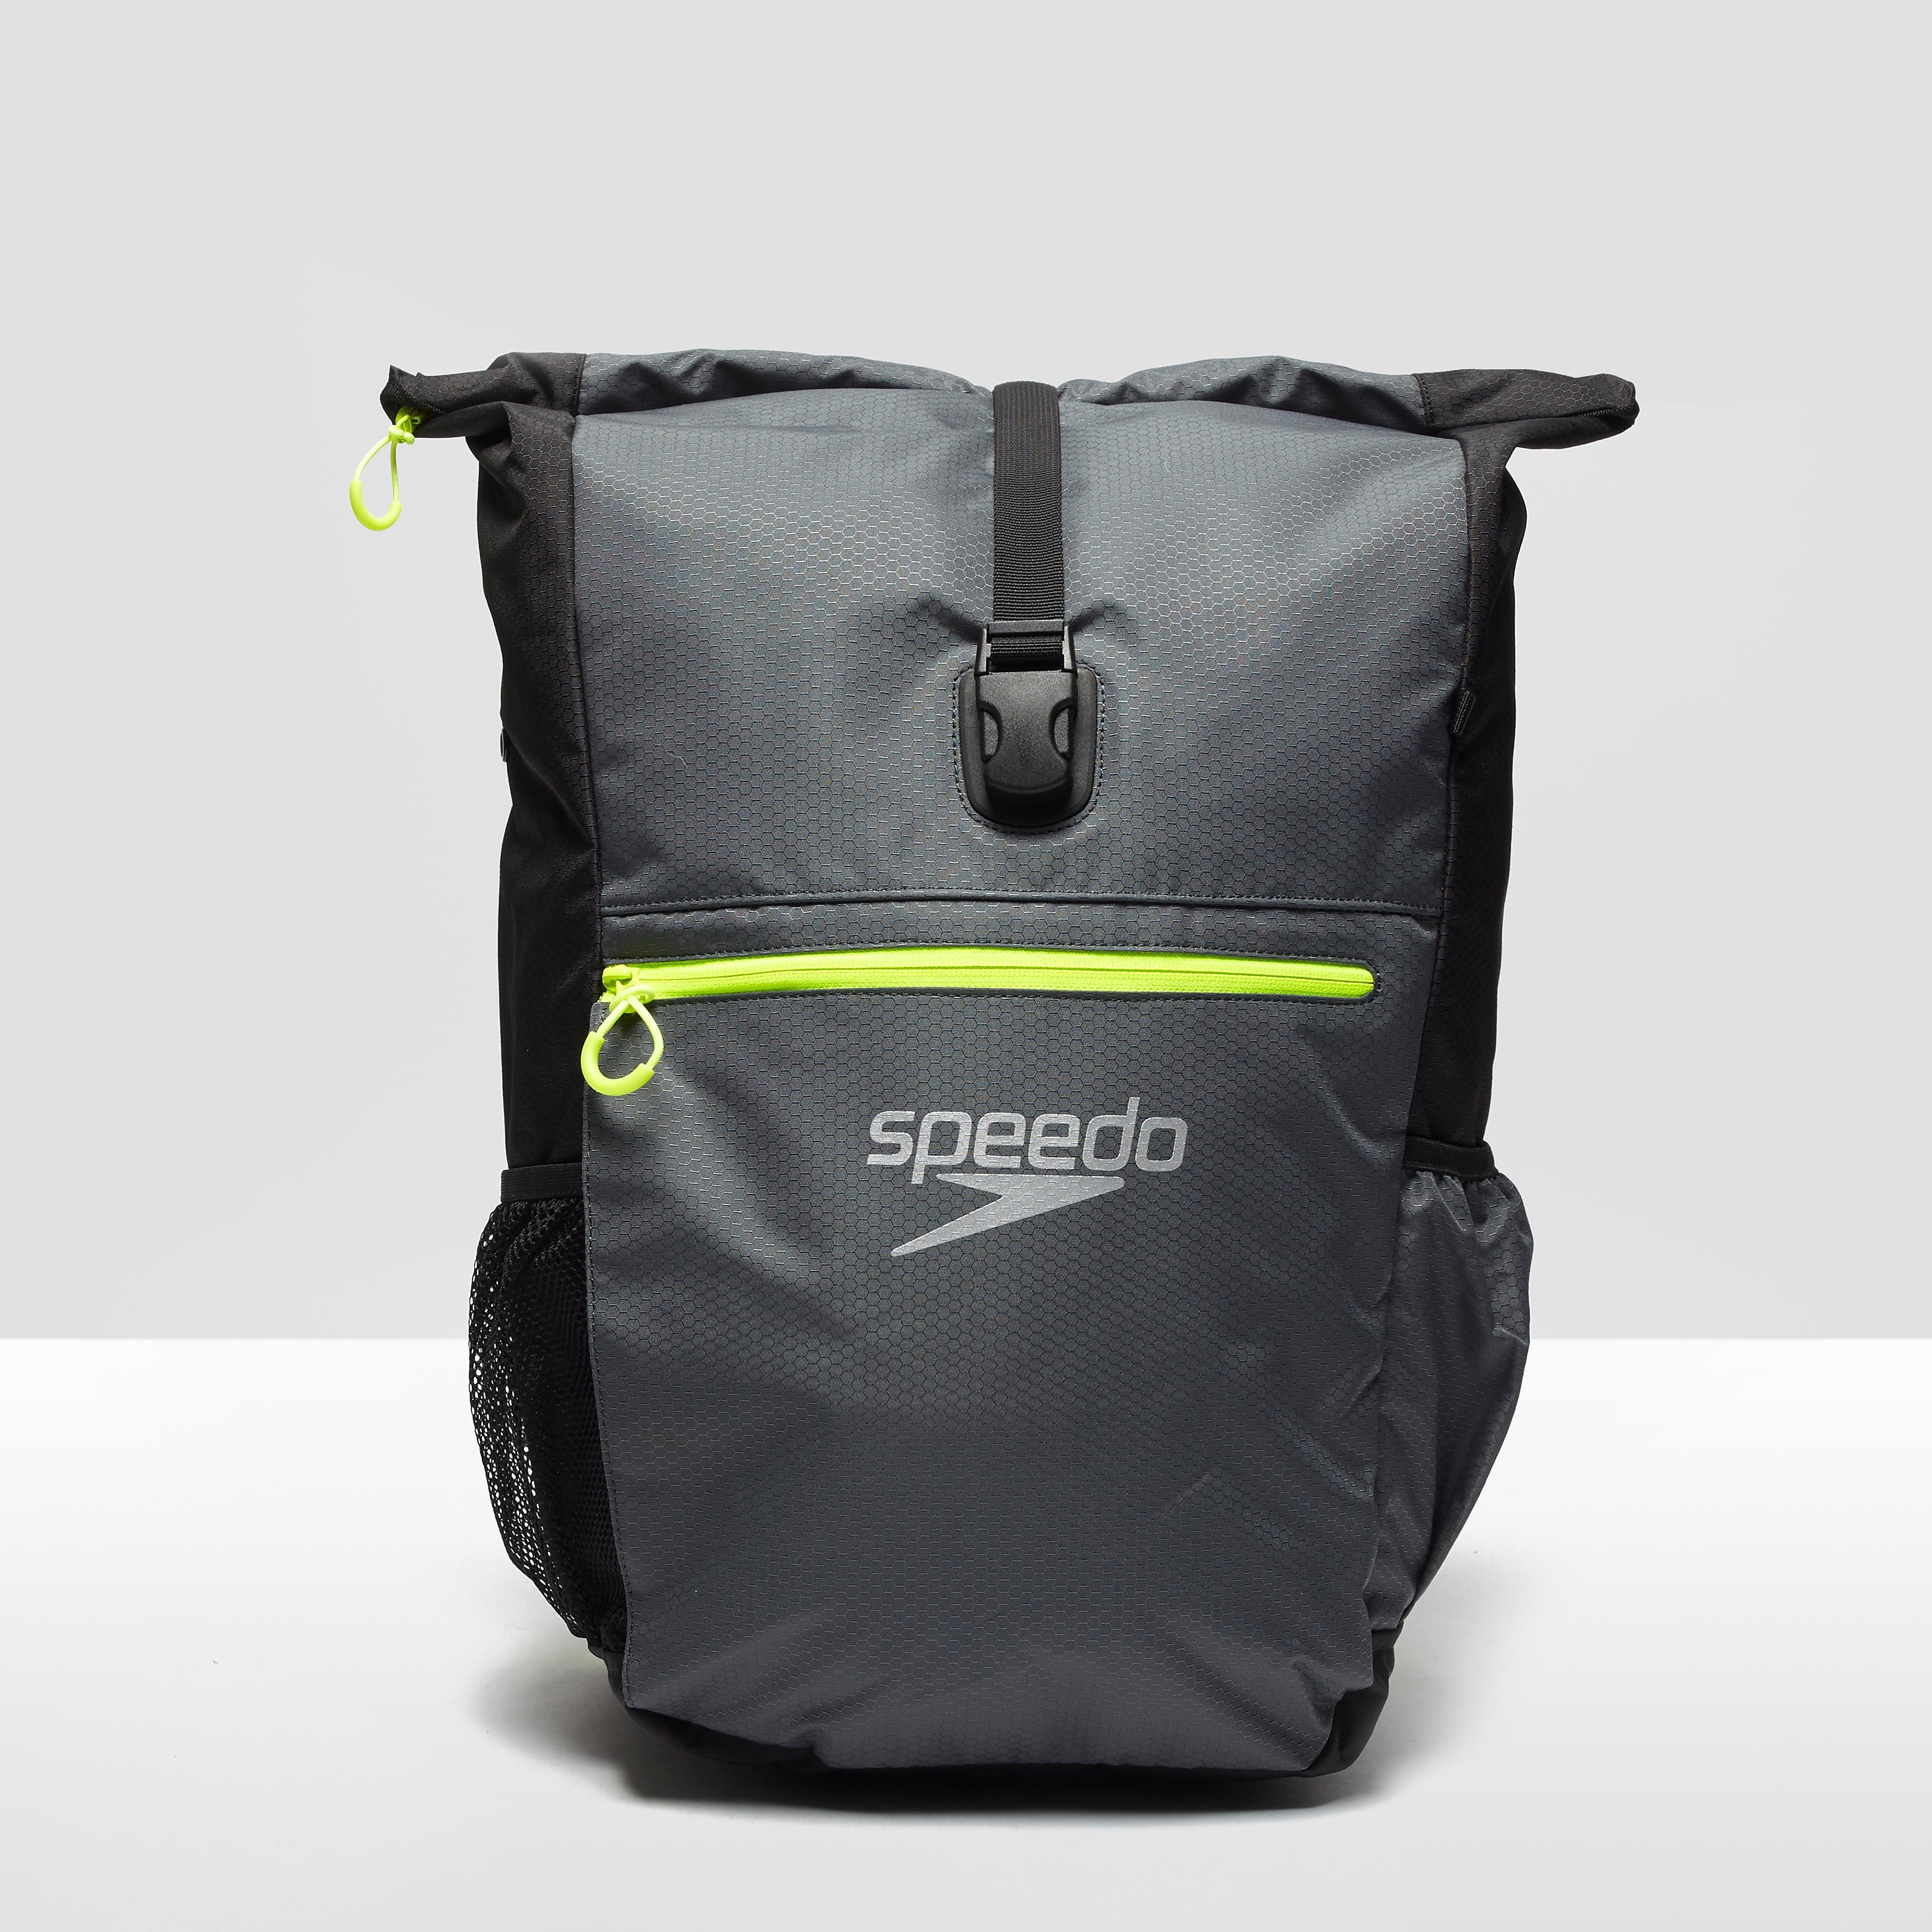 Speedo Team Rucksack III